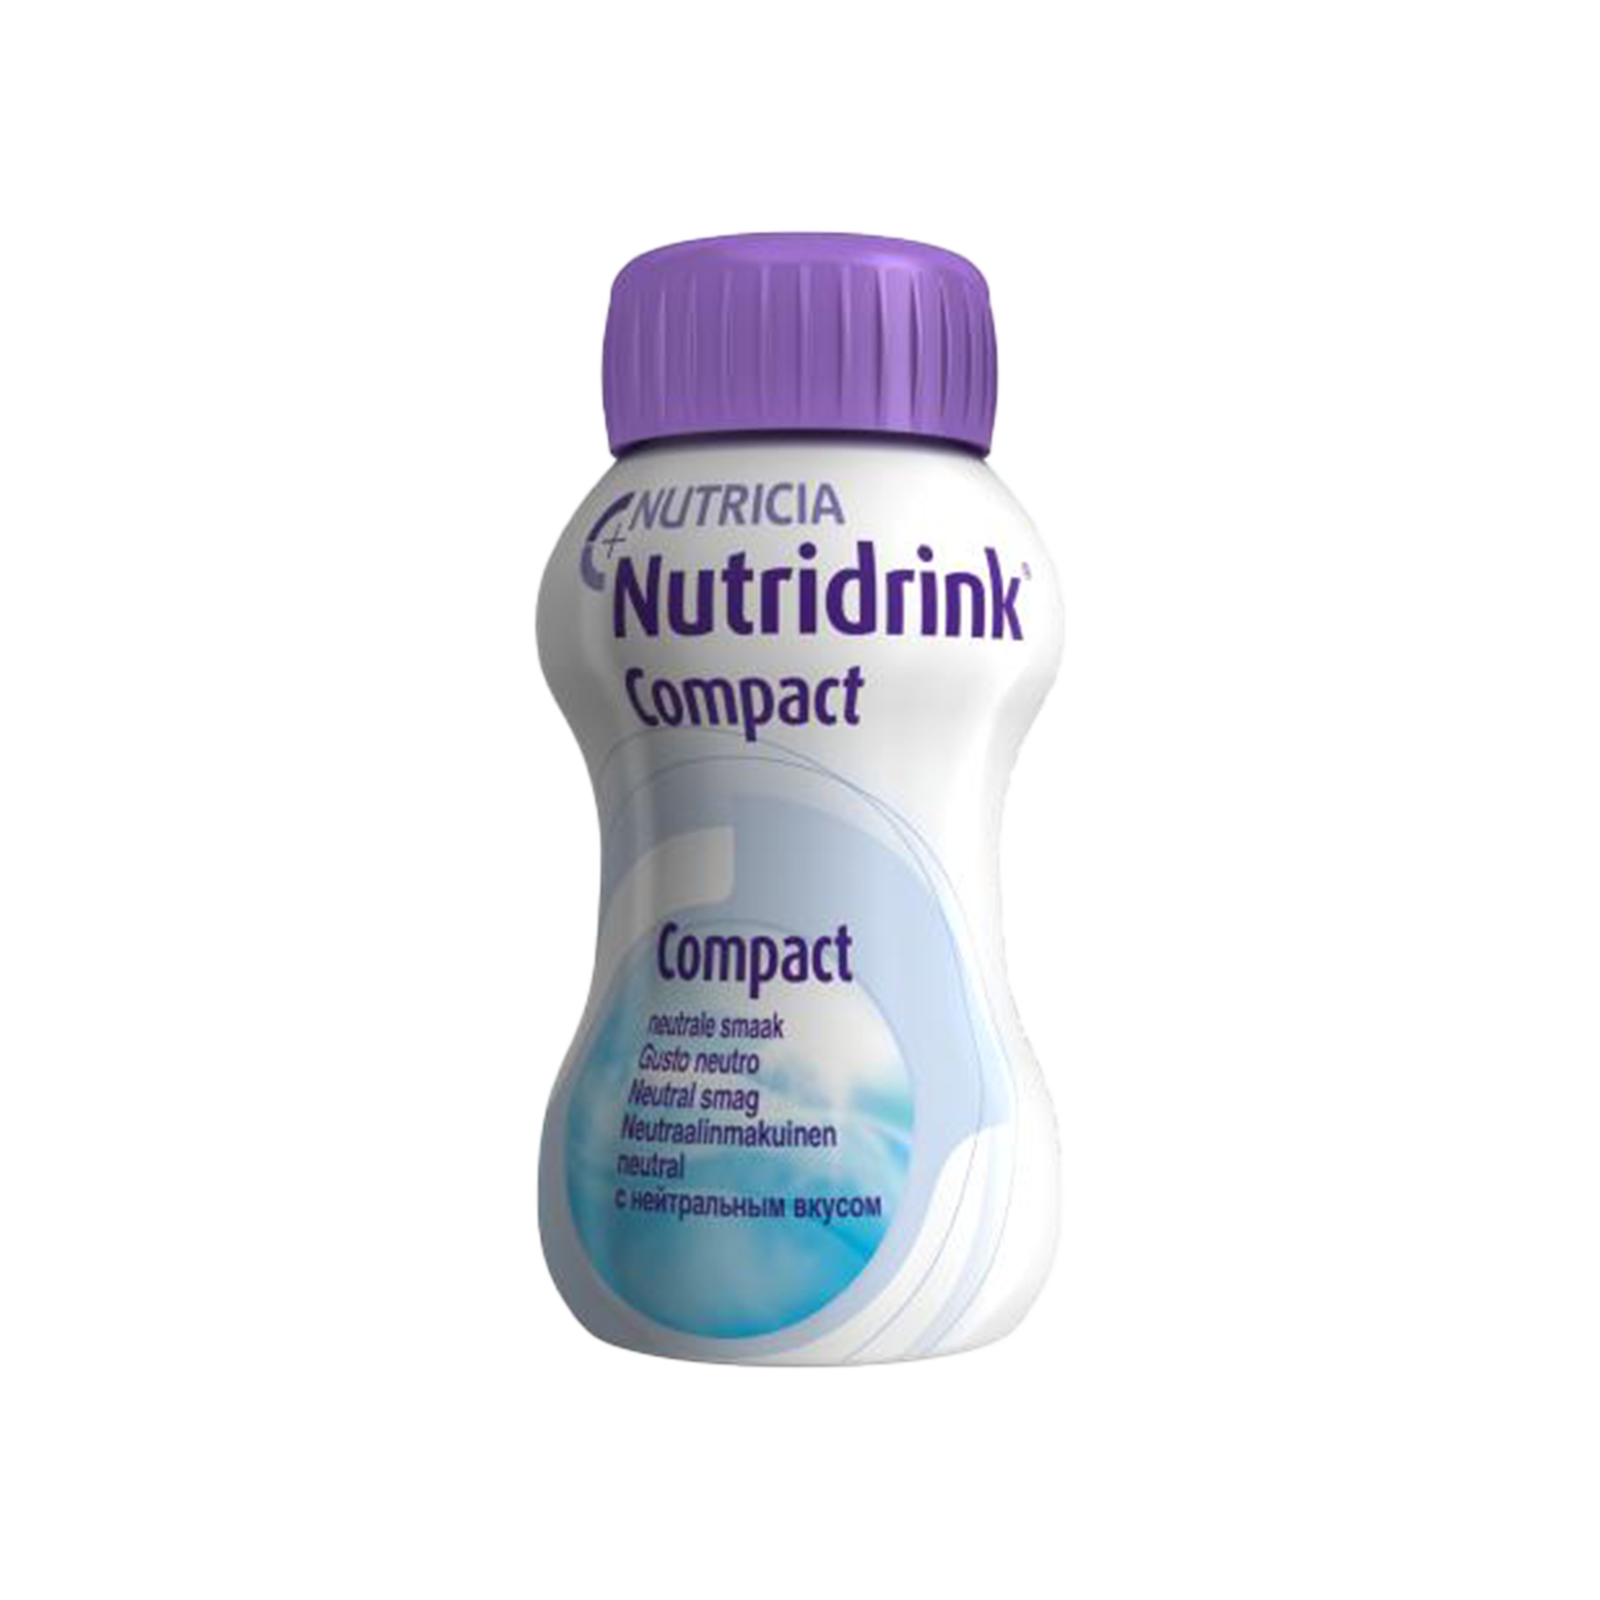 Nutridrink Compact neutro 48x Bottiglia 125 ml | Nutricia